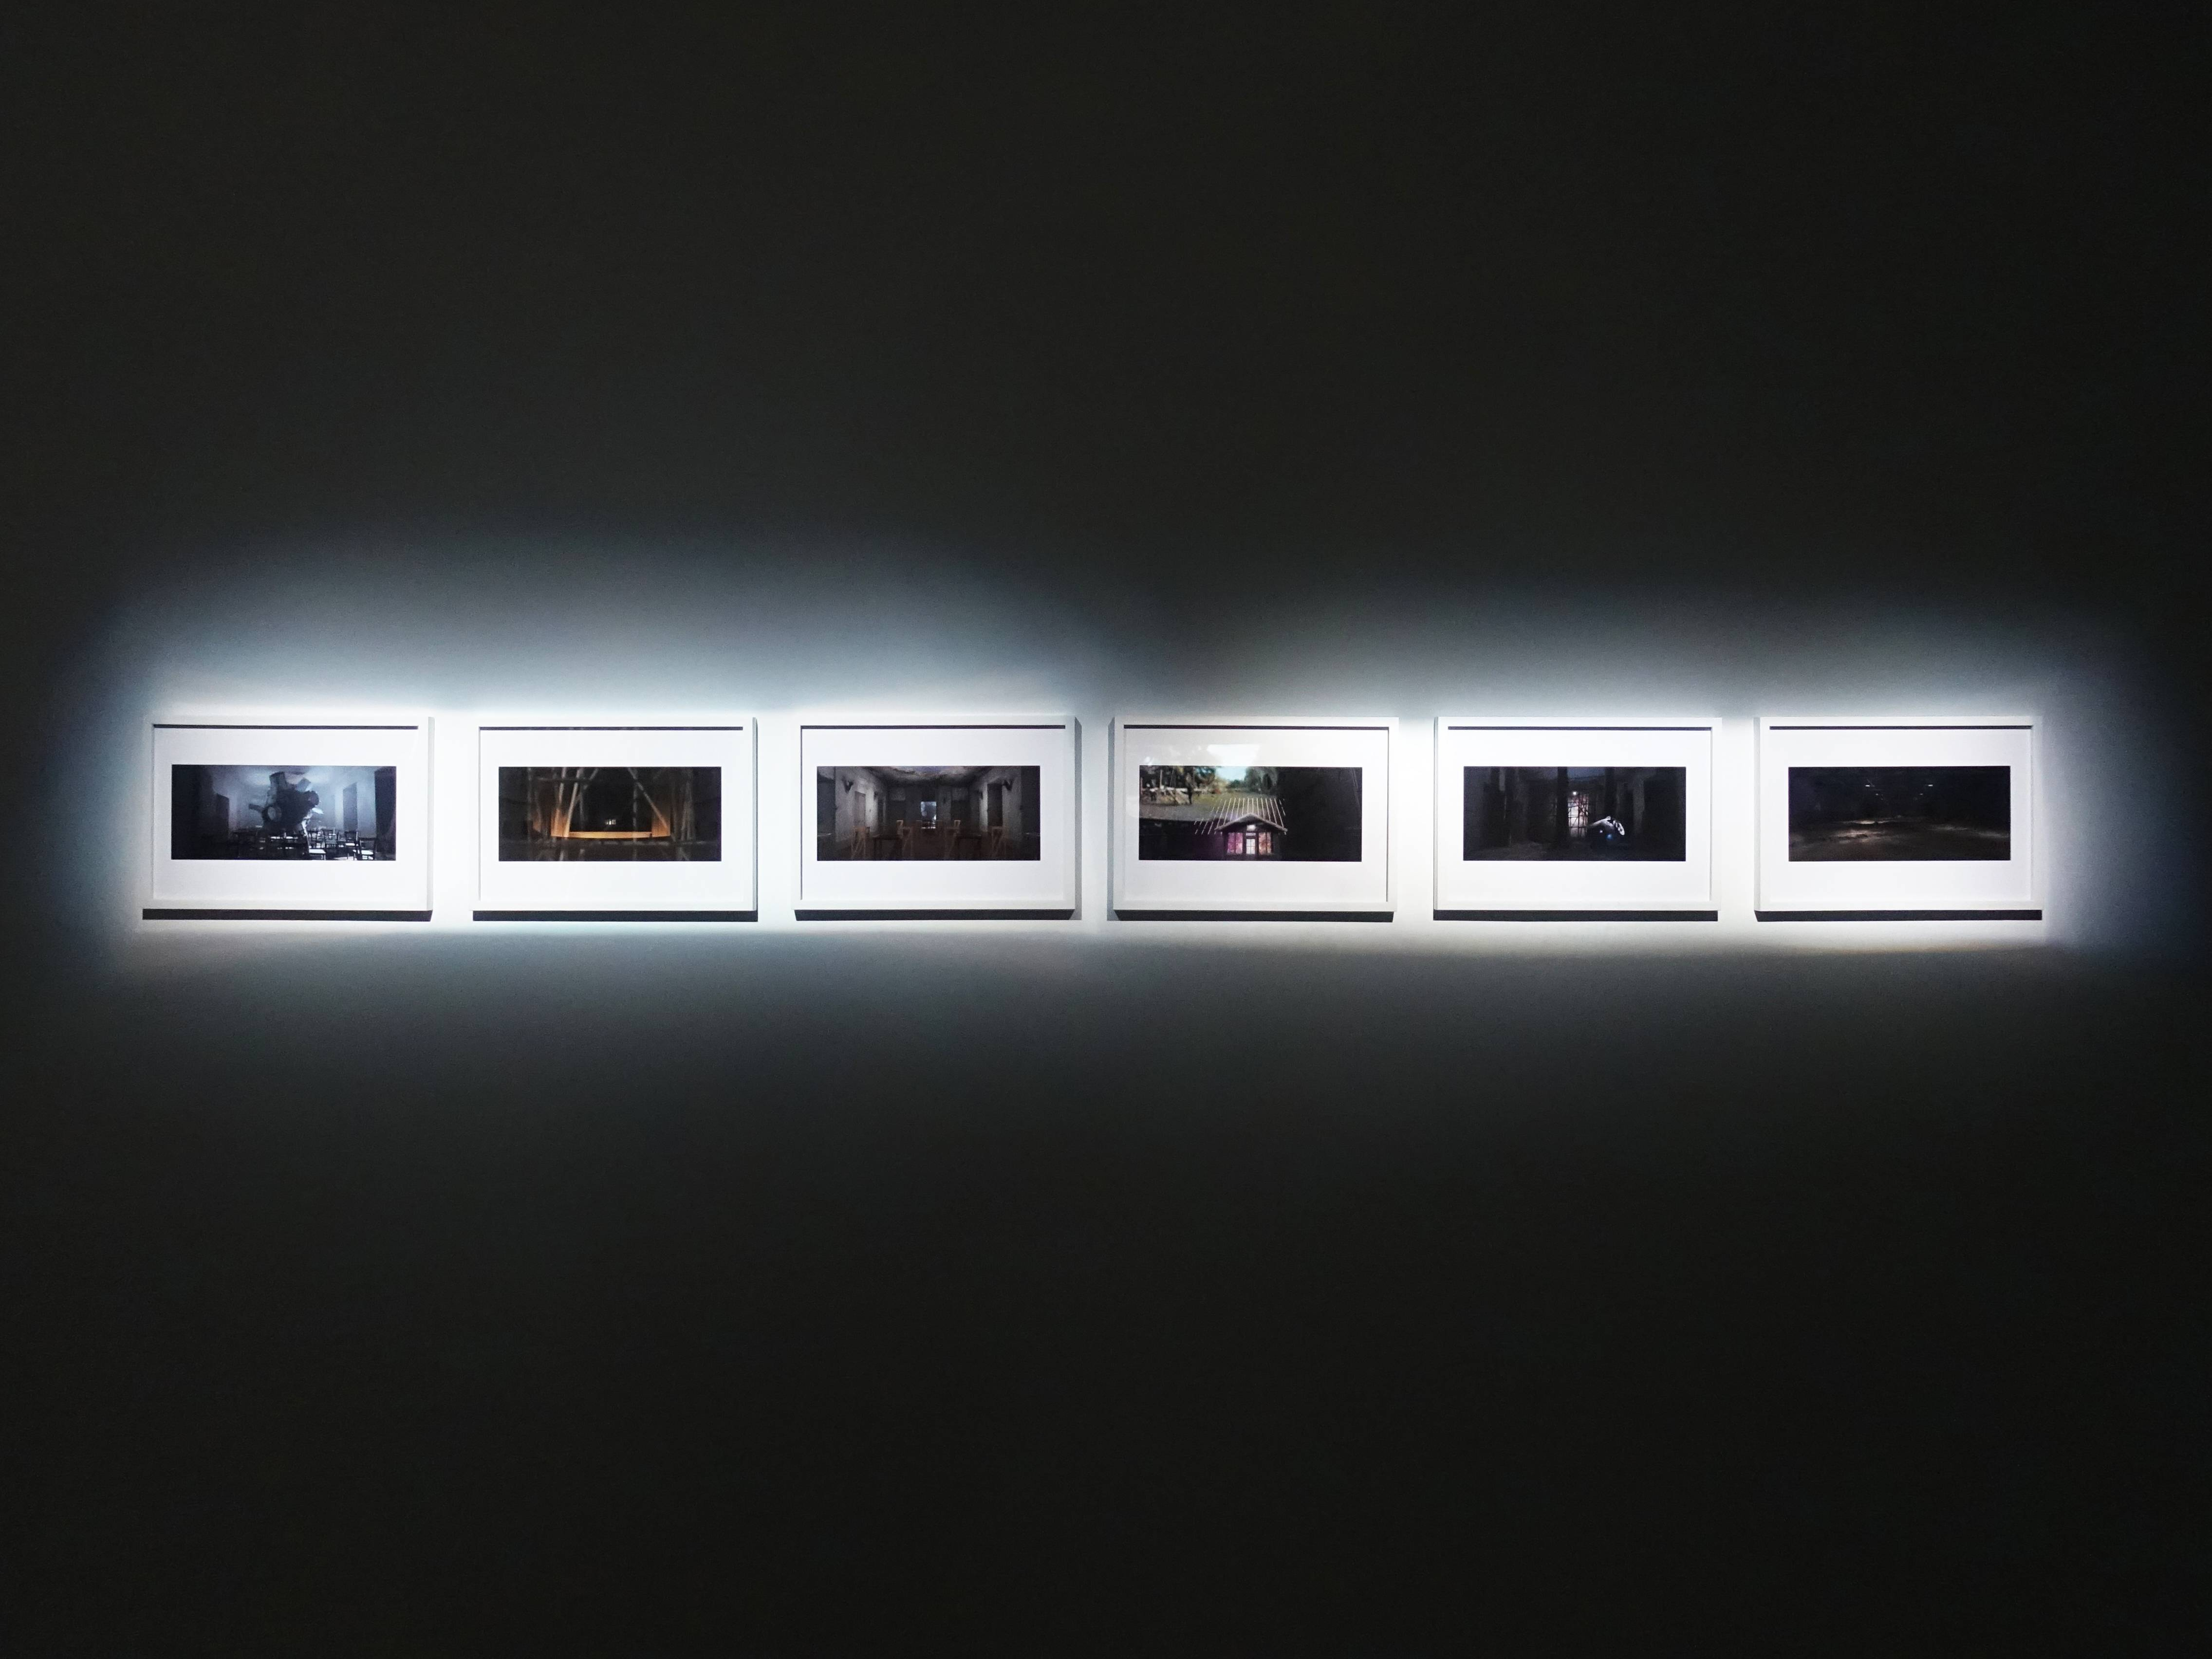 Florian Claar展出《Wanderer Frame 漫遊者》影格系列。